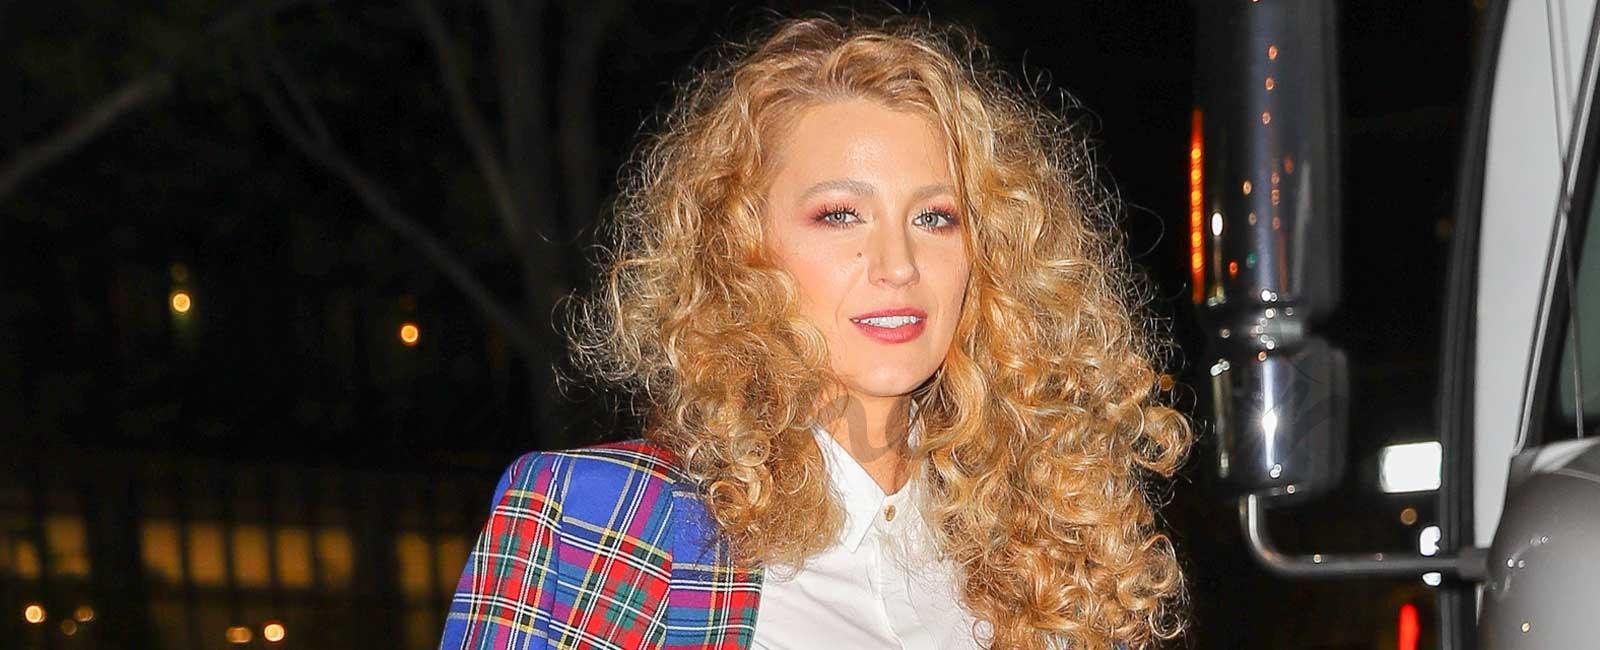 "El impactante look ""escocés"" de Blake Lively"